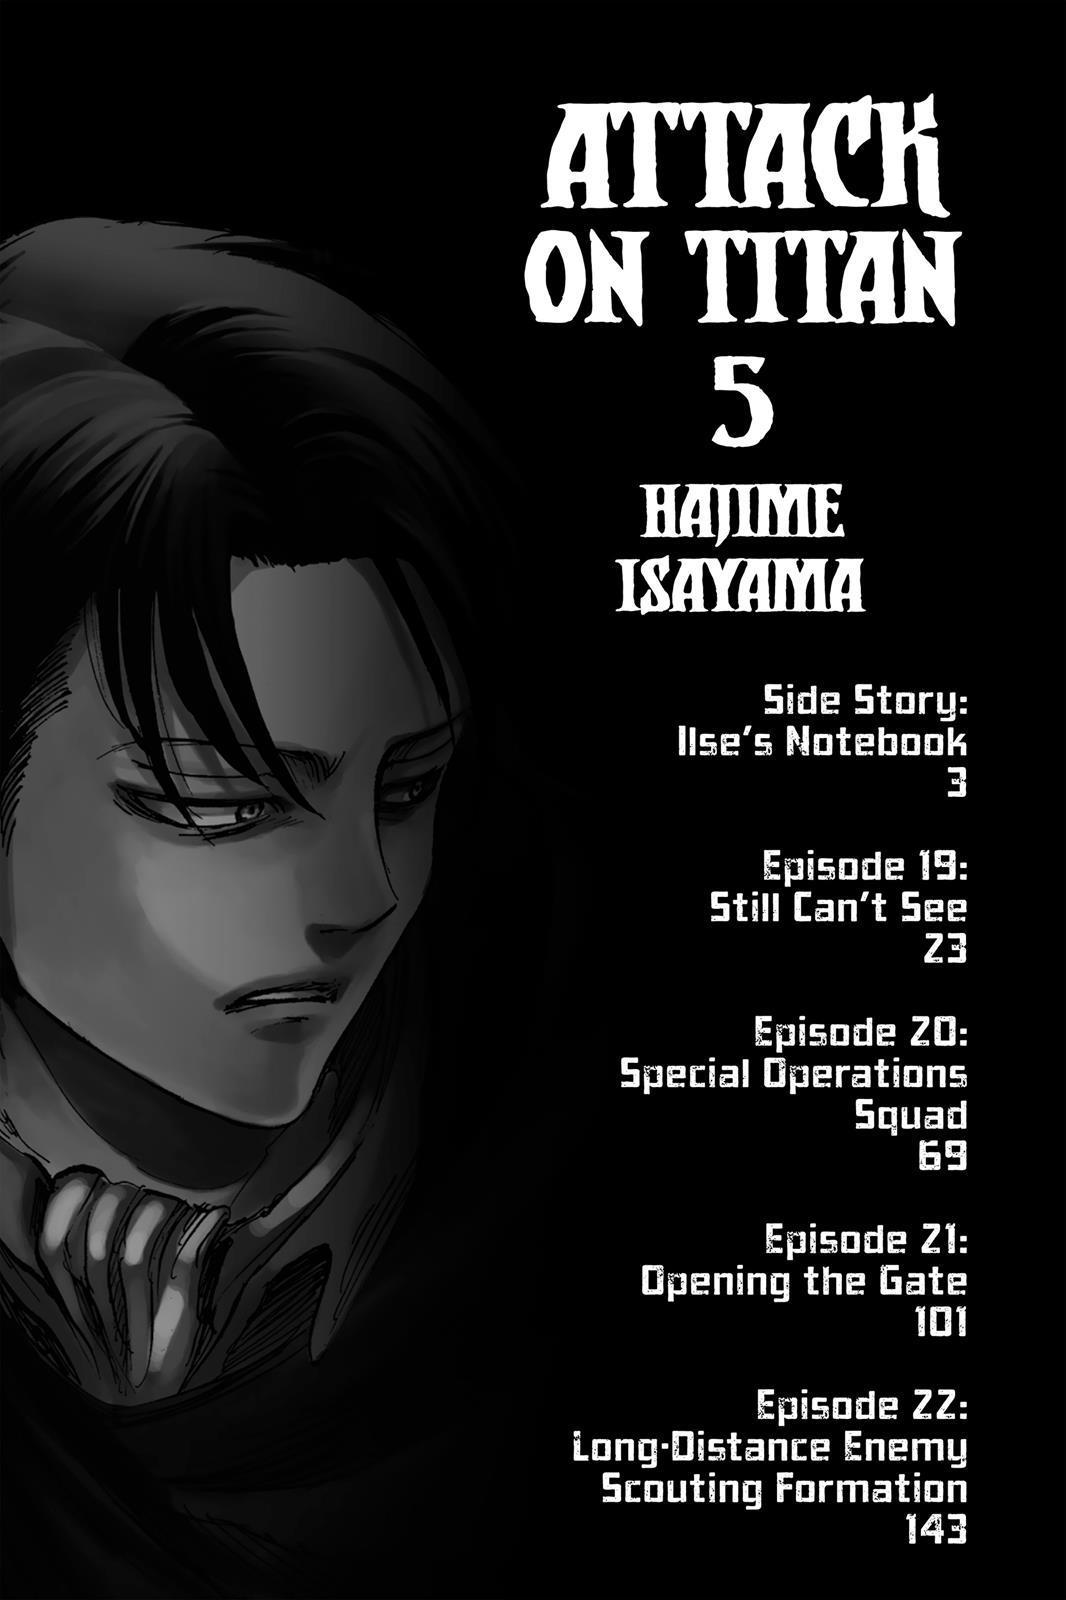 Attack On Titan, Episode 18.5 image 003